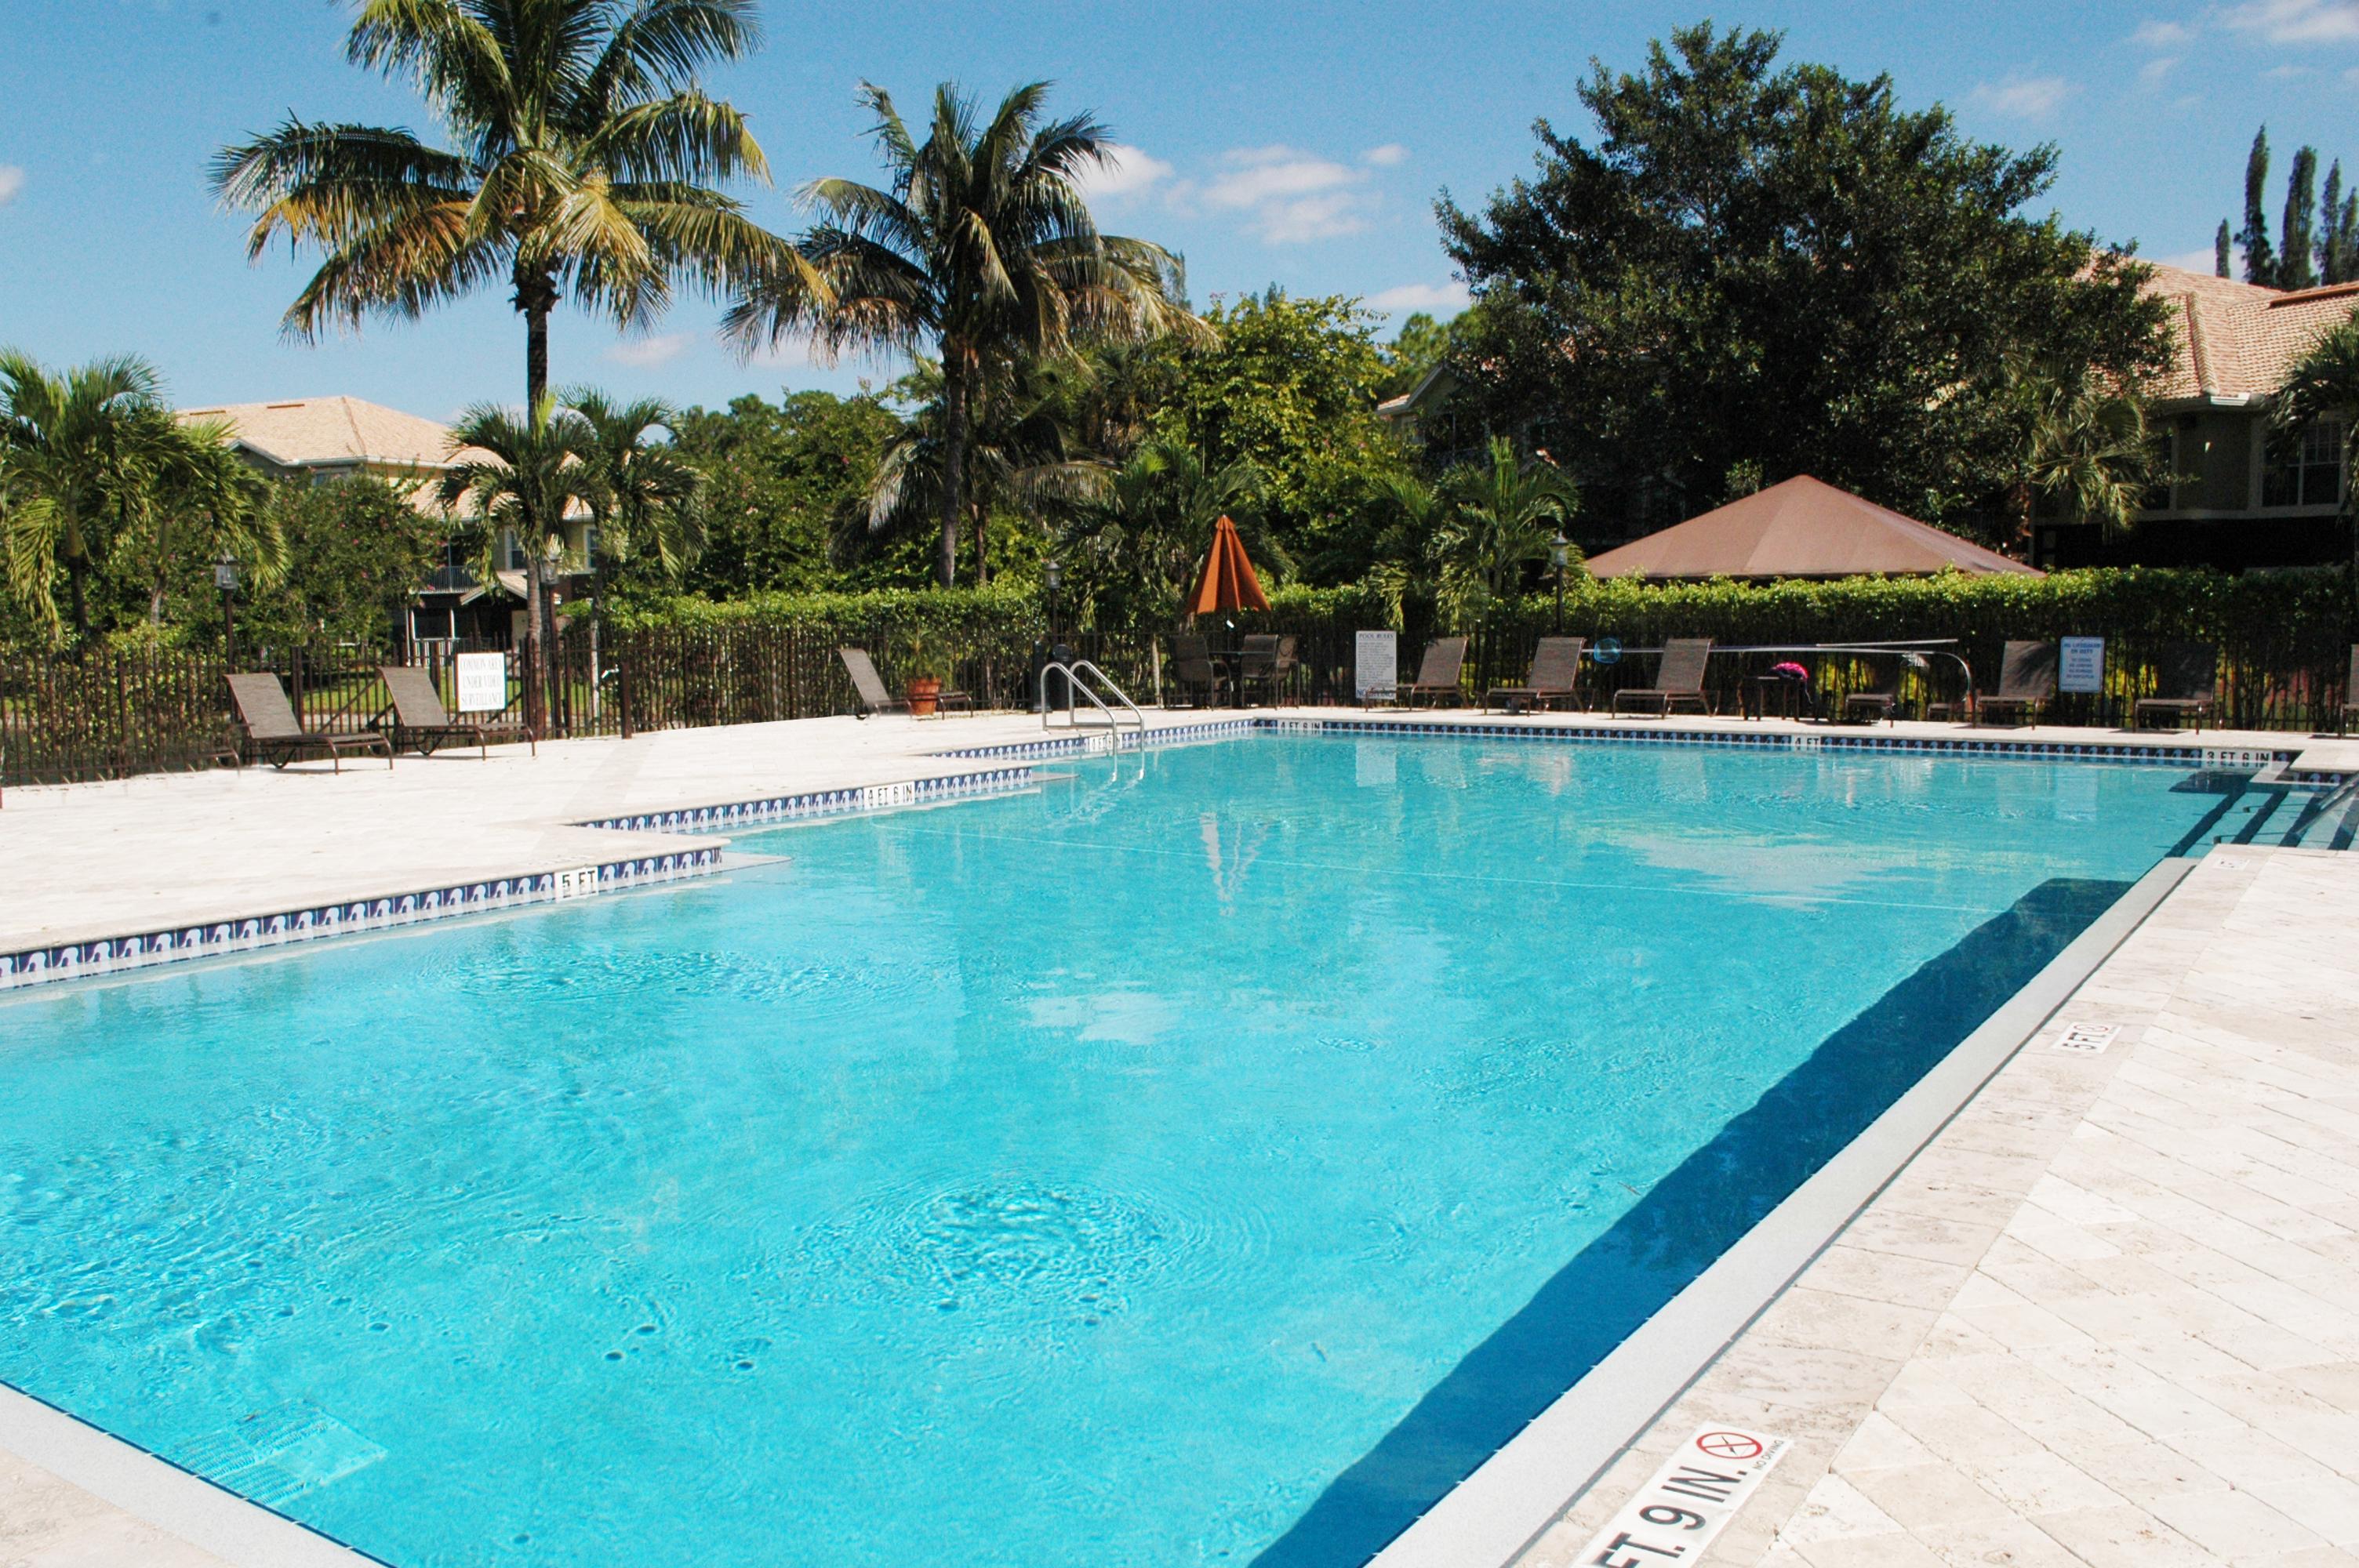 Ashlar Apartments 13001 Corbel Cir, Fort Myers, FL 33907 - YP.com